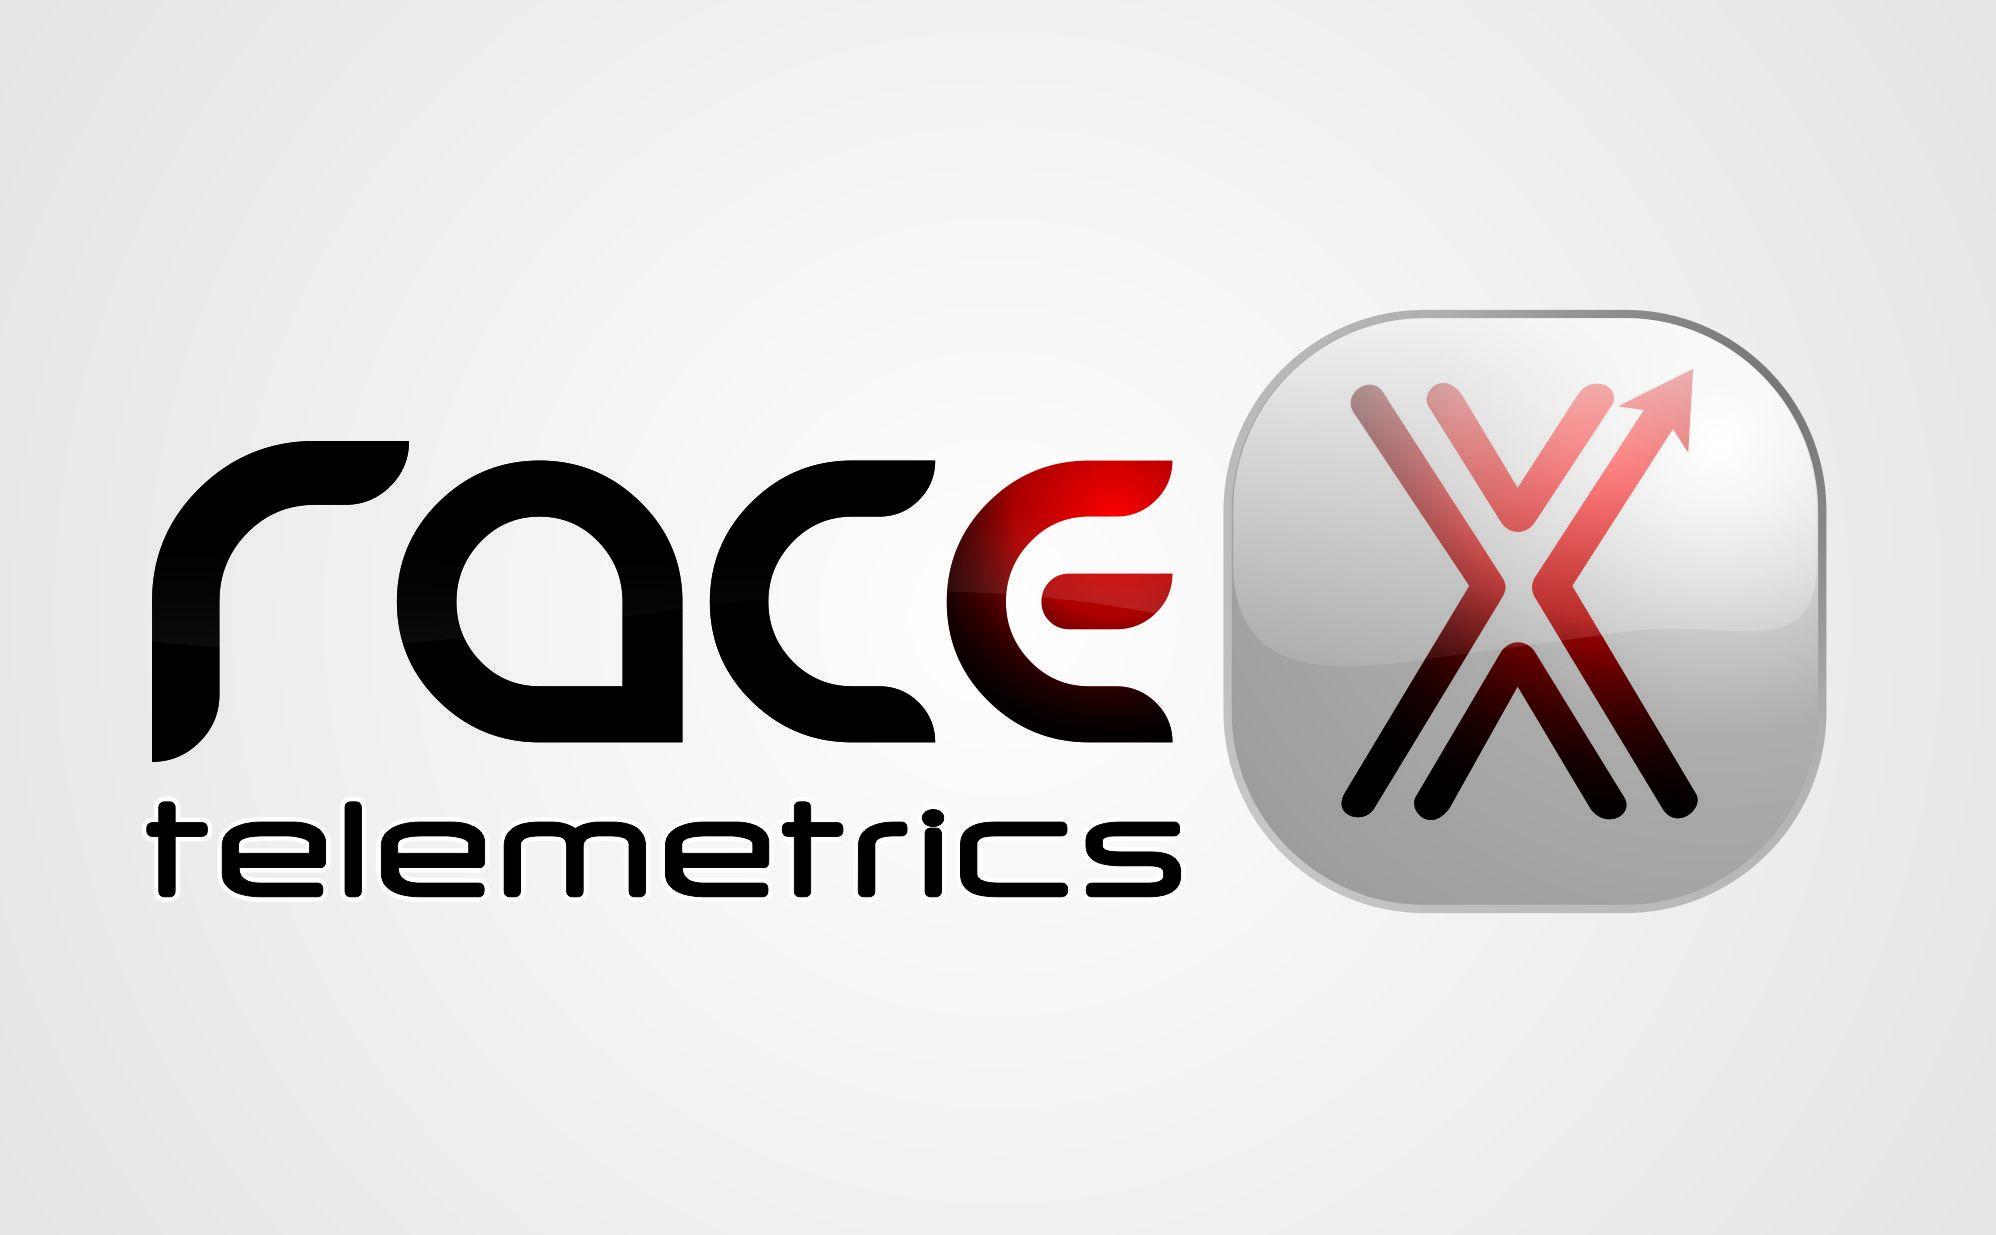 Логотип RaceX Telemetrics  - дизайнер DDesign2014